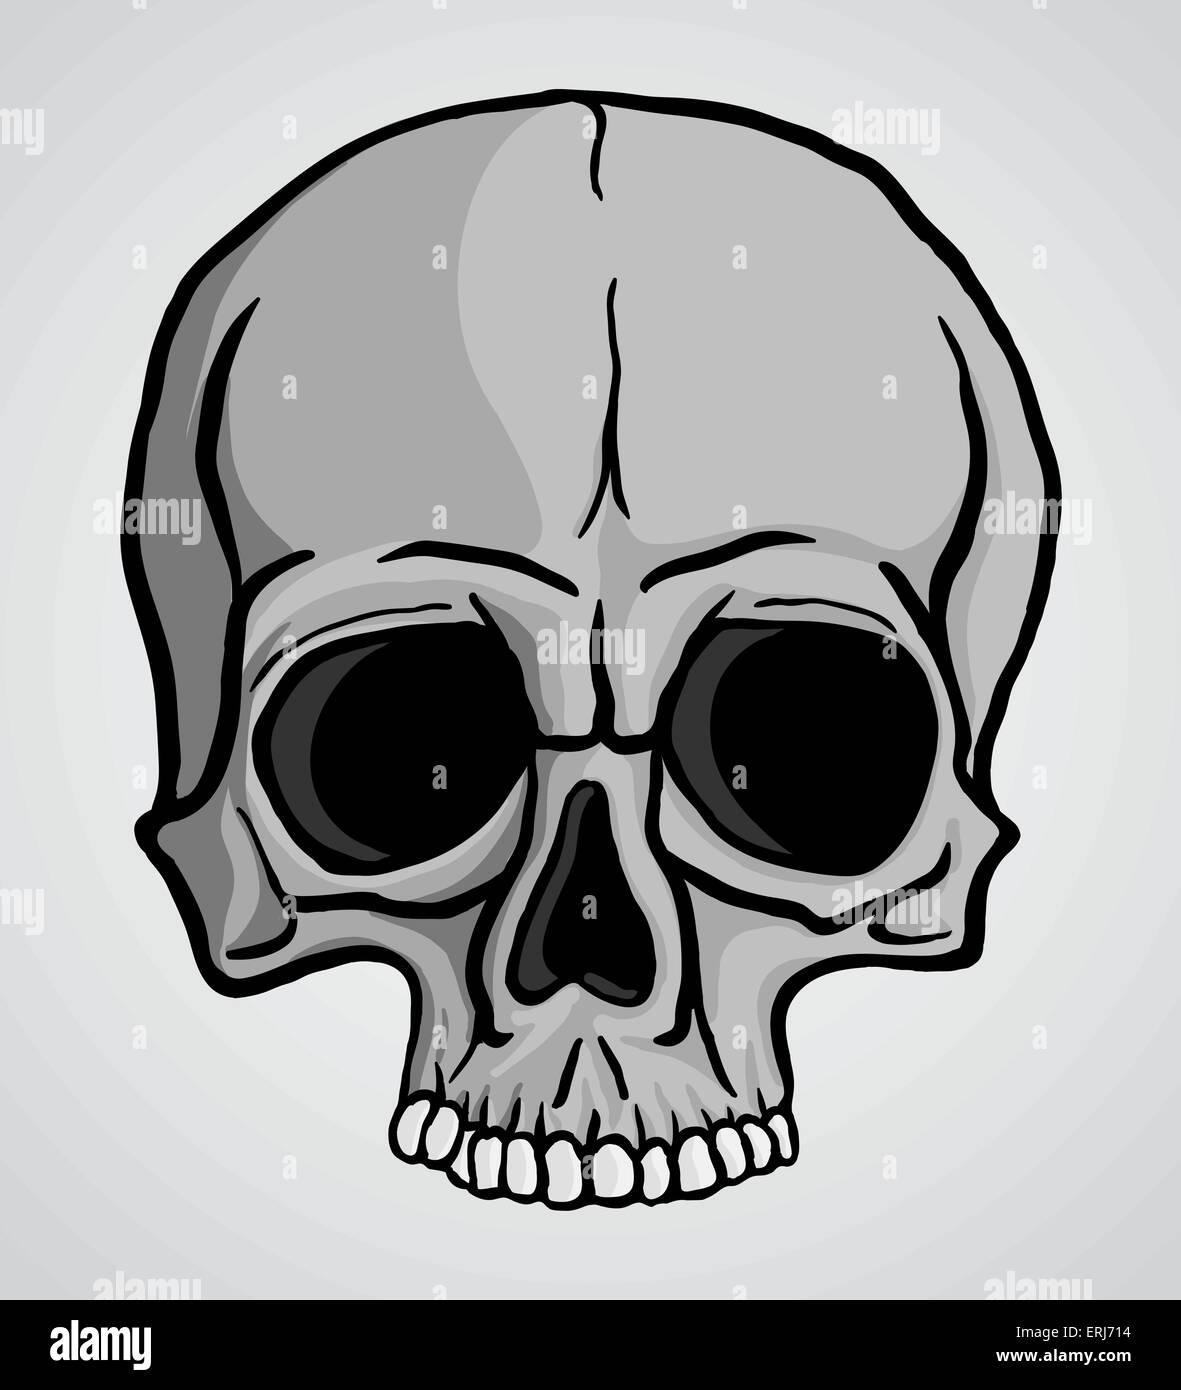 Dessin Libre crâne humain sur fond gris. dessin libre.vector illustration